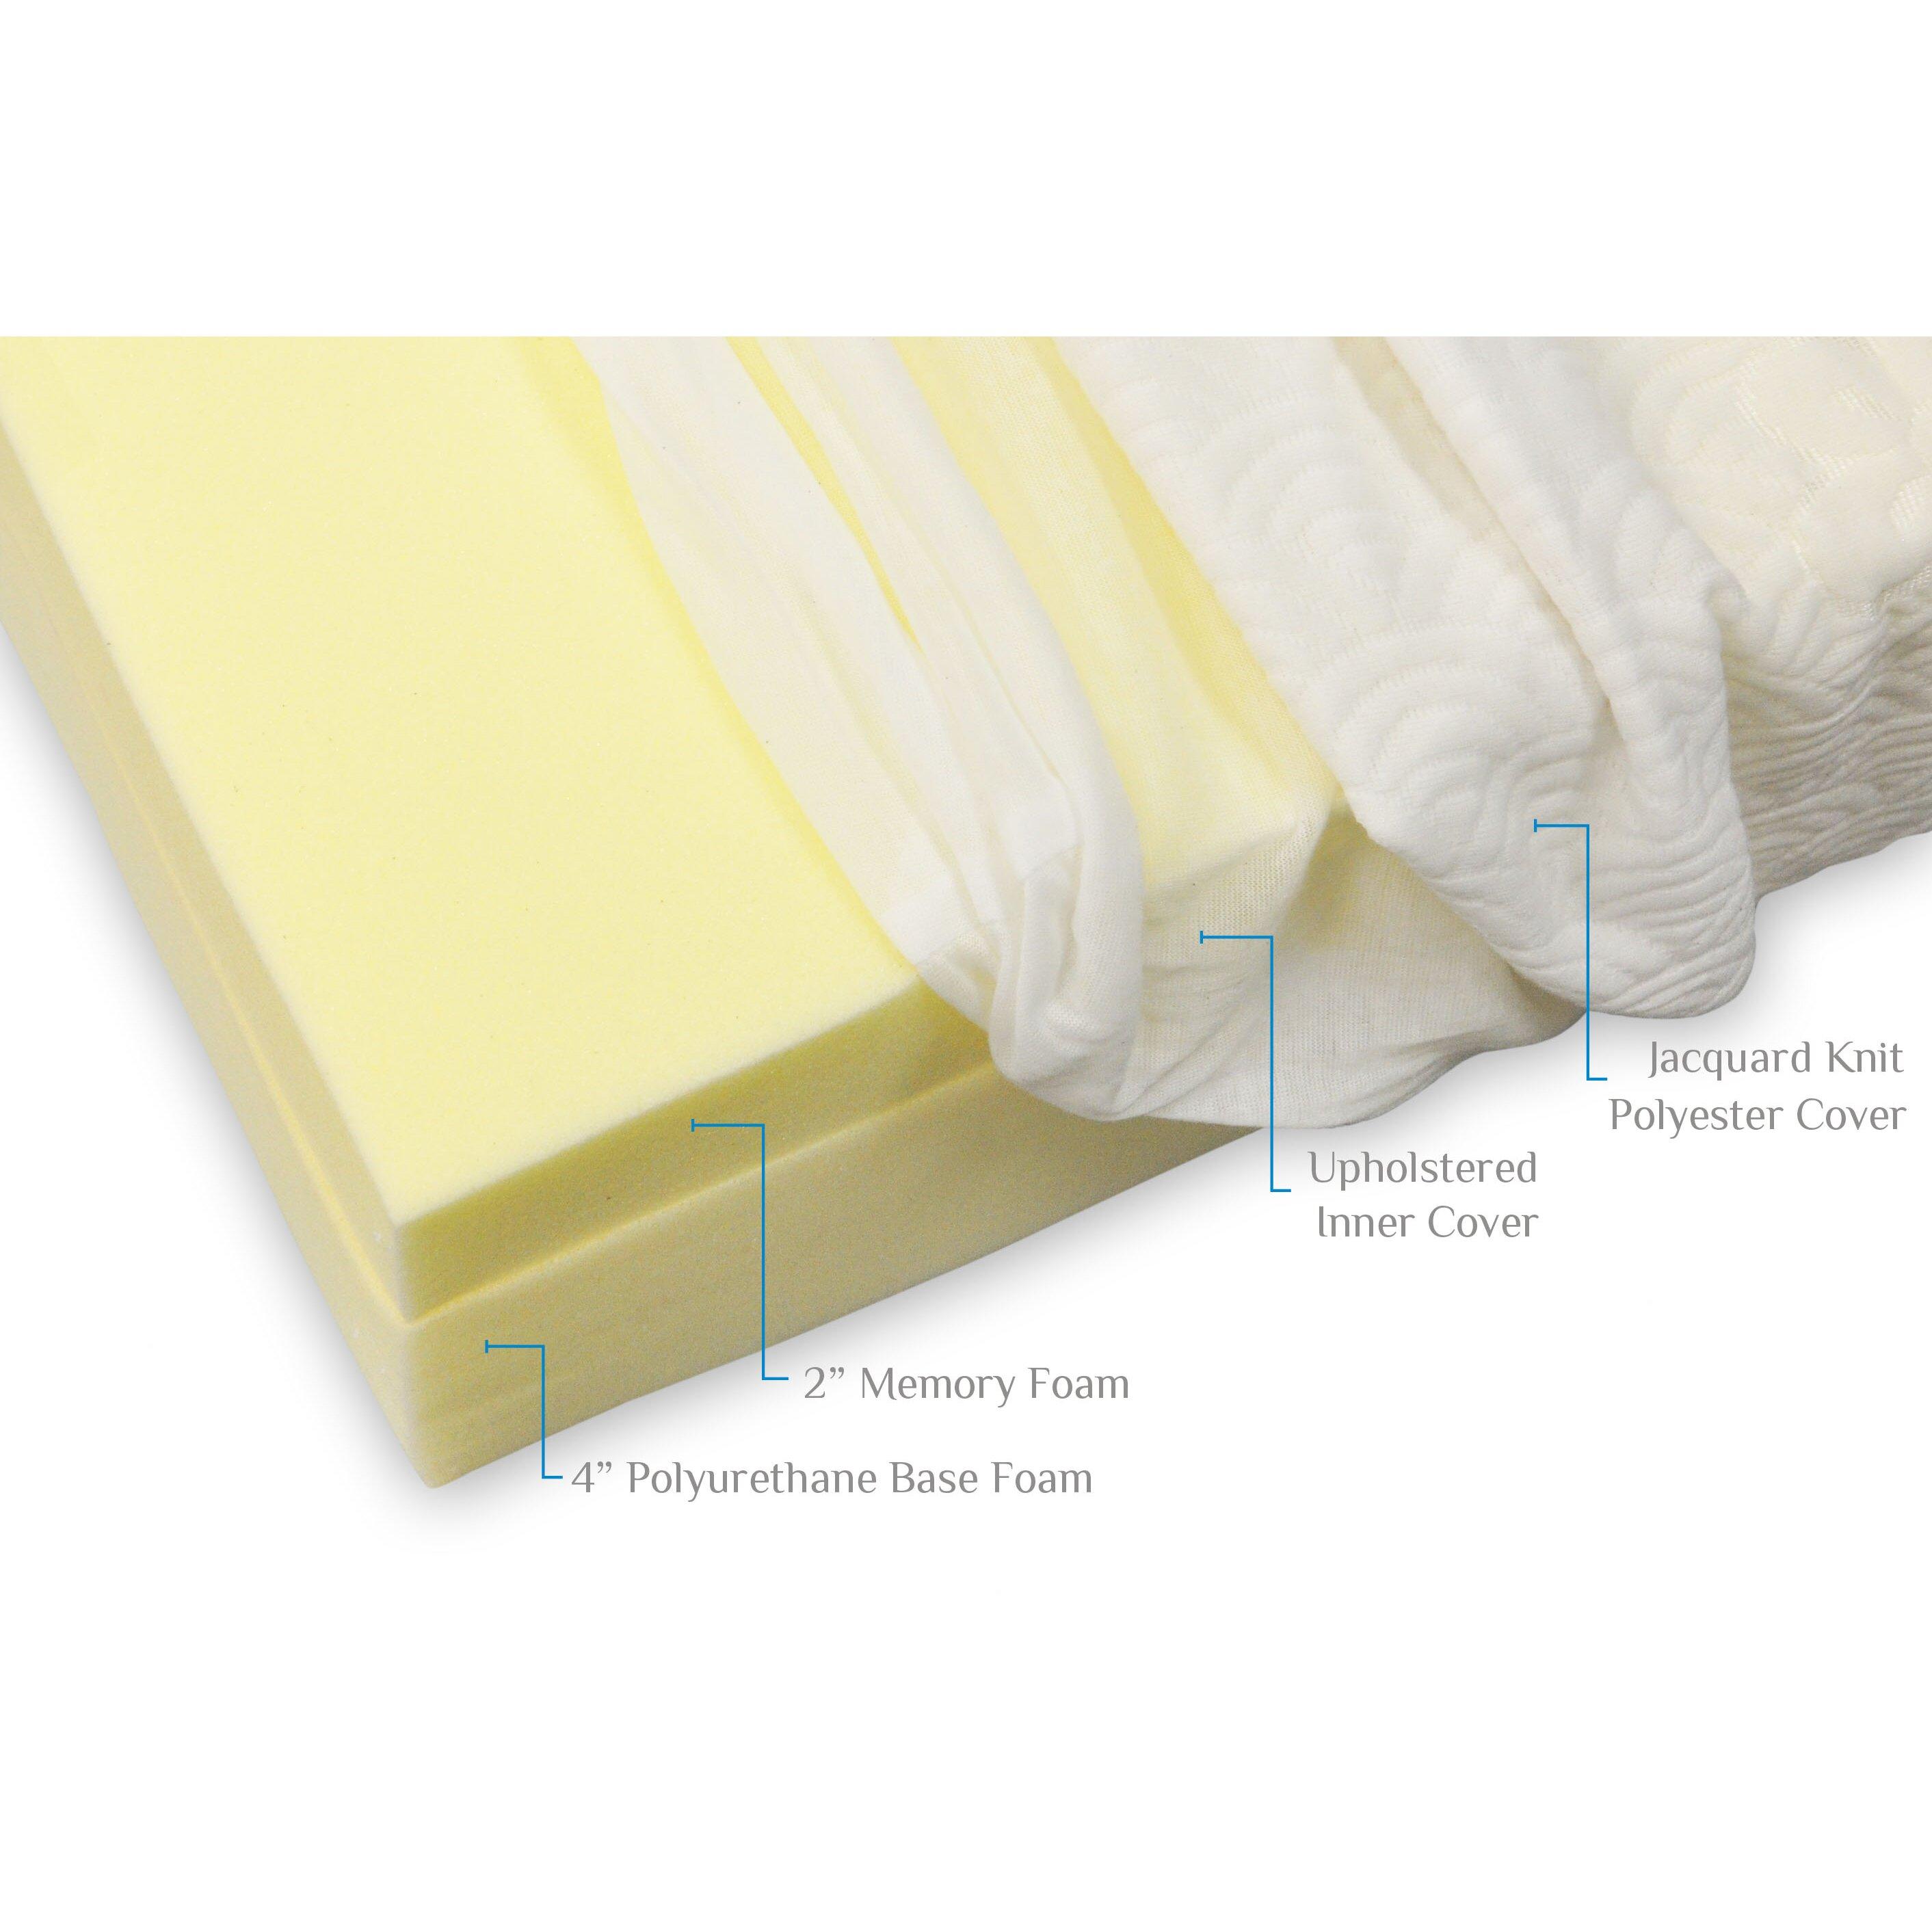 Pragma Bed 6 Firm Memory Foam Mattress Reviews